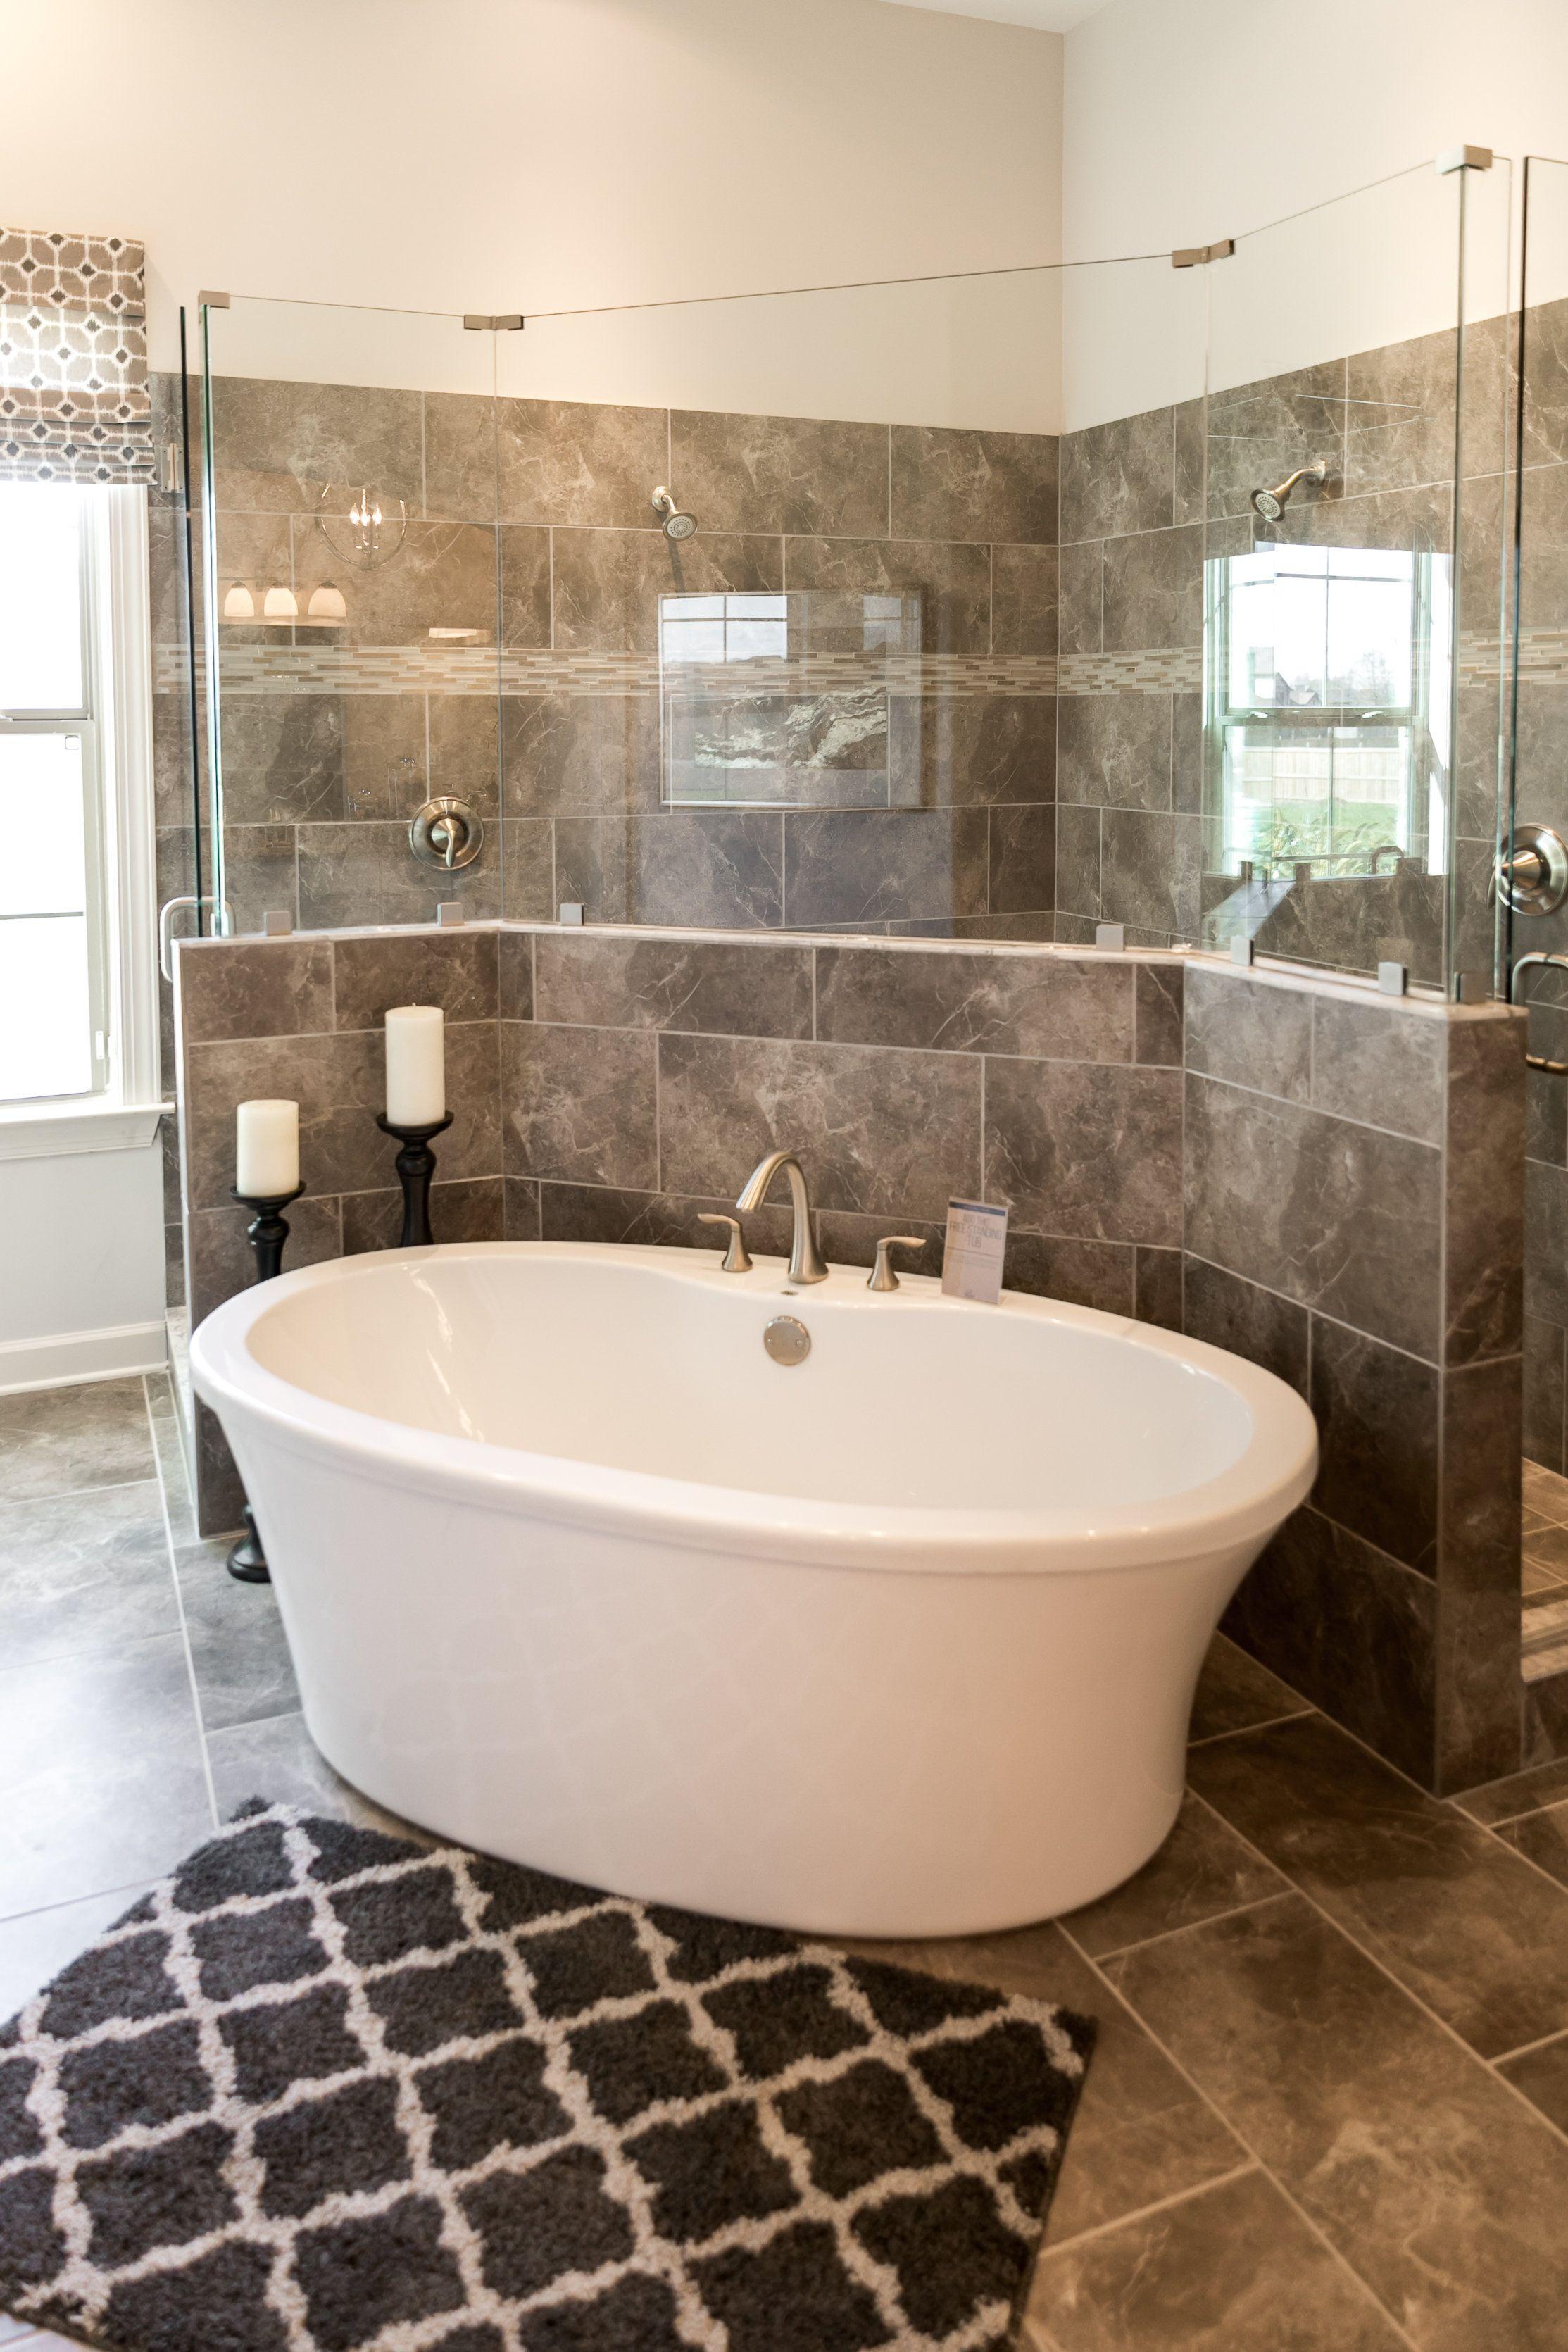 Regency Homebuilders: Master Bath, Drop-In Tub, Walk-In Shower ...